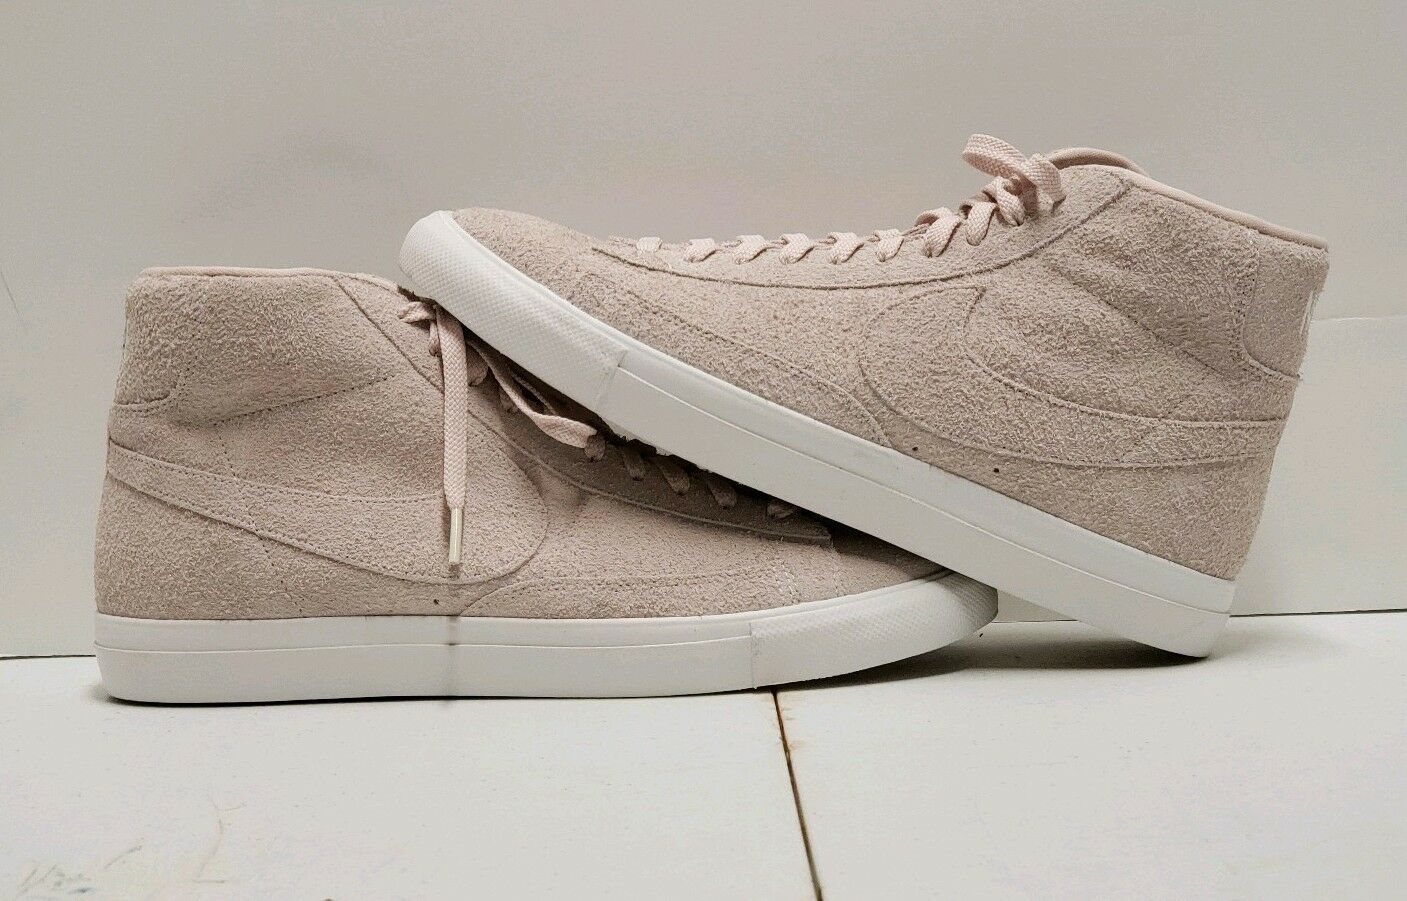 Nike Blazer Suede Mid Silt Red White Sz. 11.5  Brand New